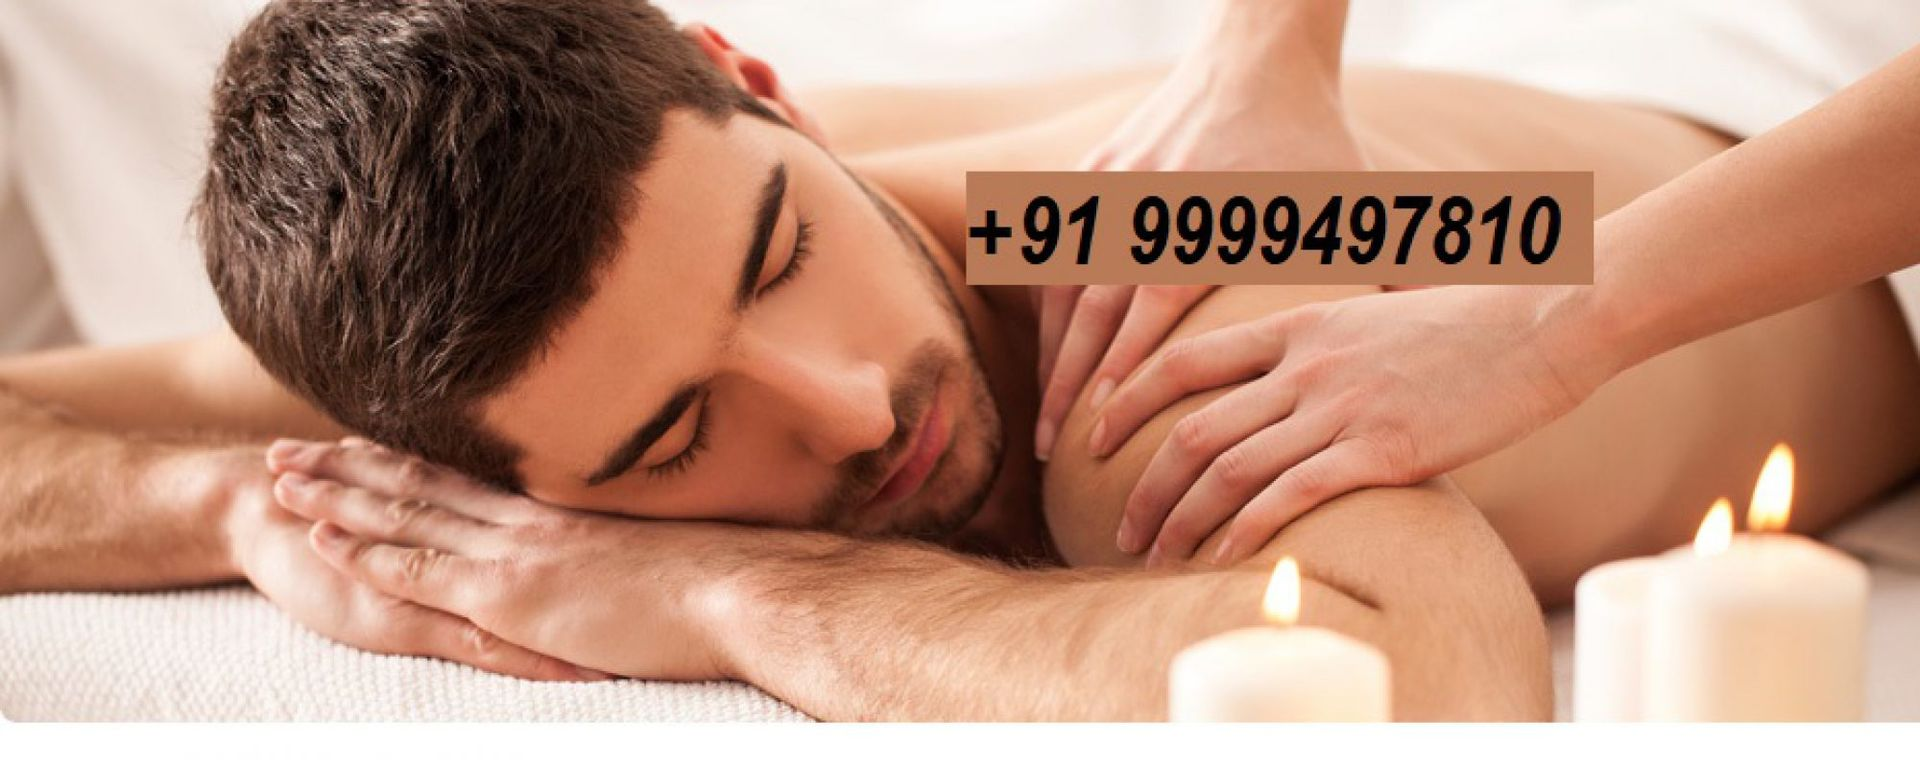 Benefits of Thai massage – Body to Body Massage in Faridabad